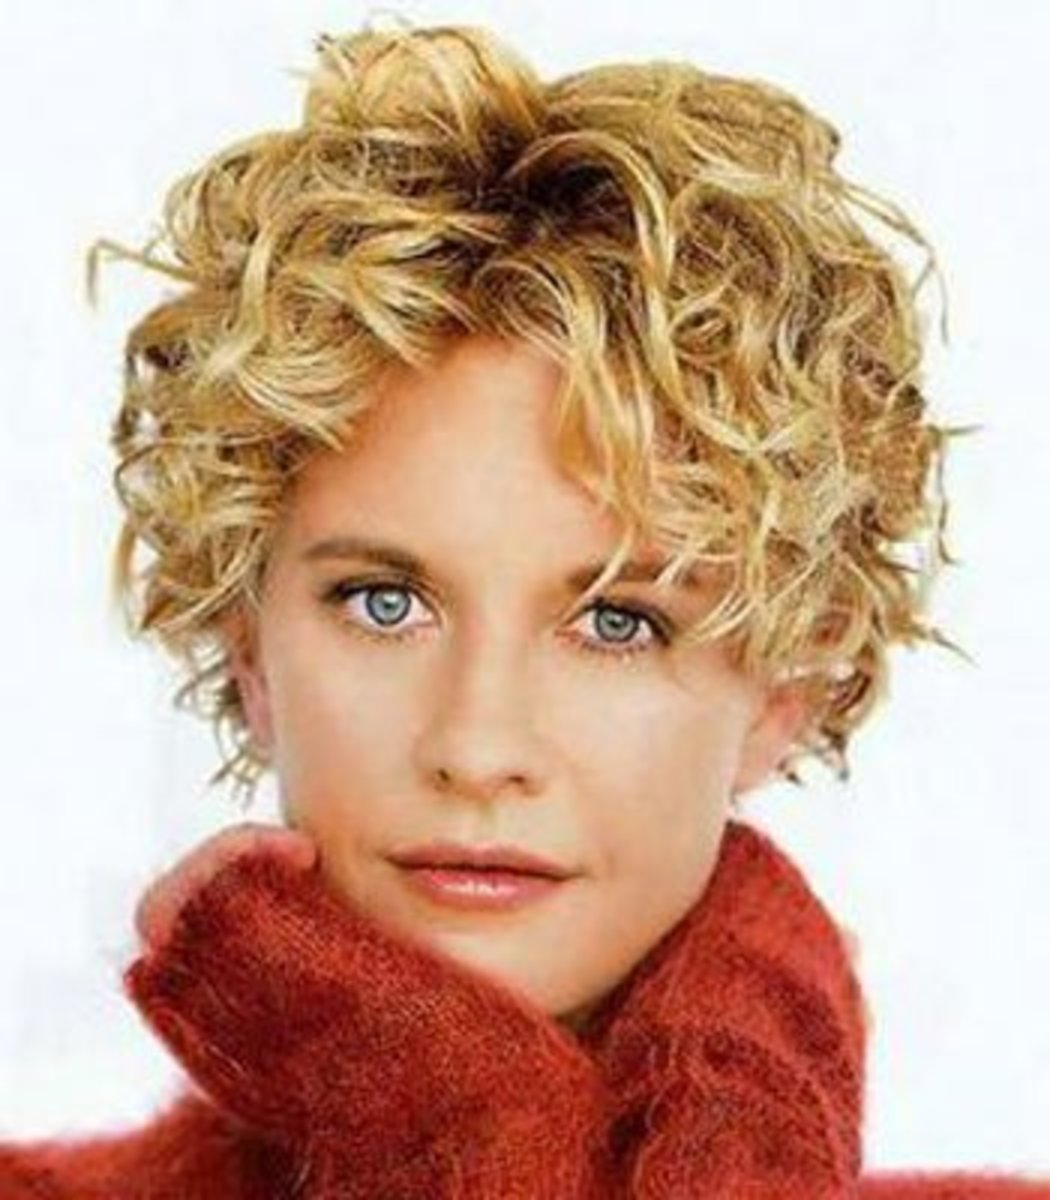 Meg Ryan: cute short curly hair